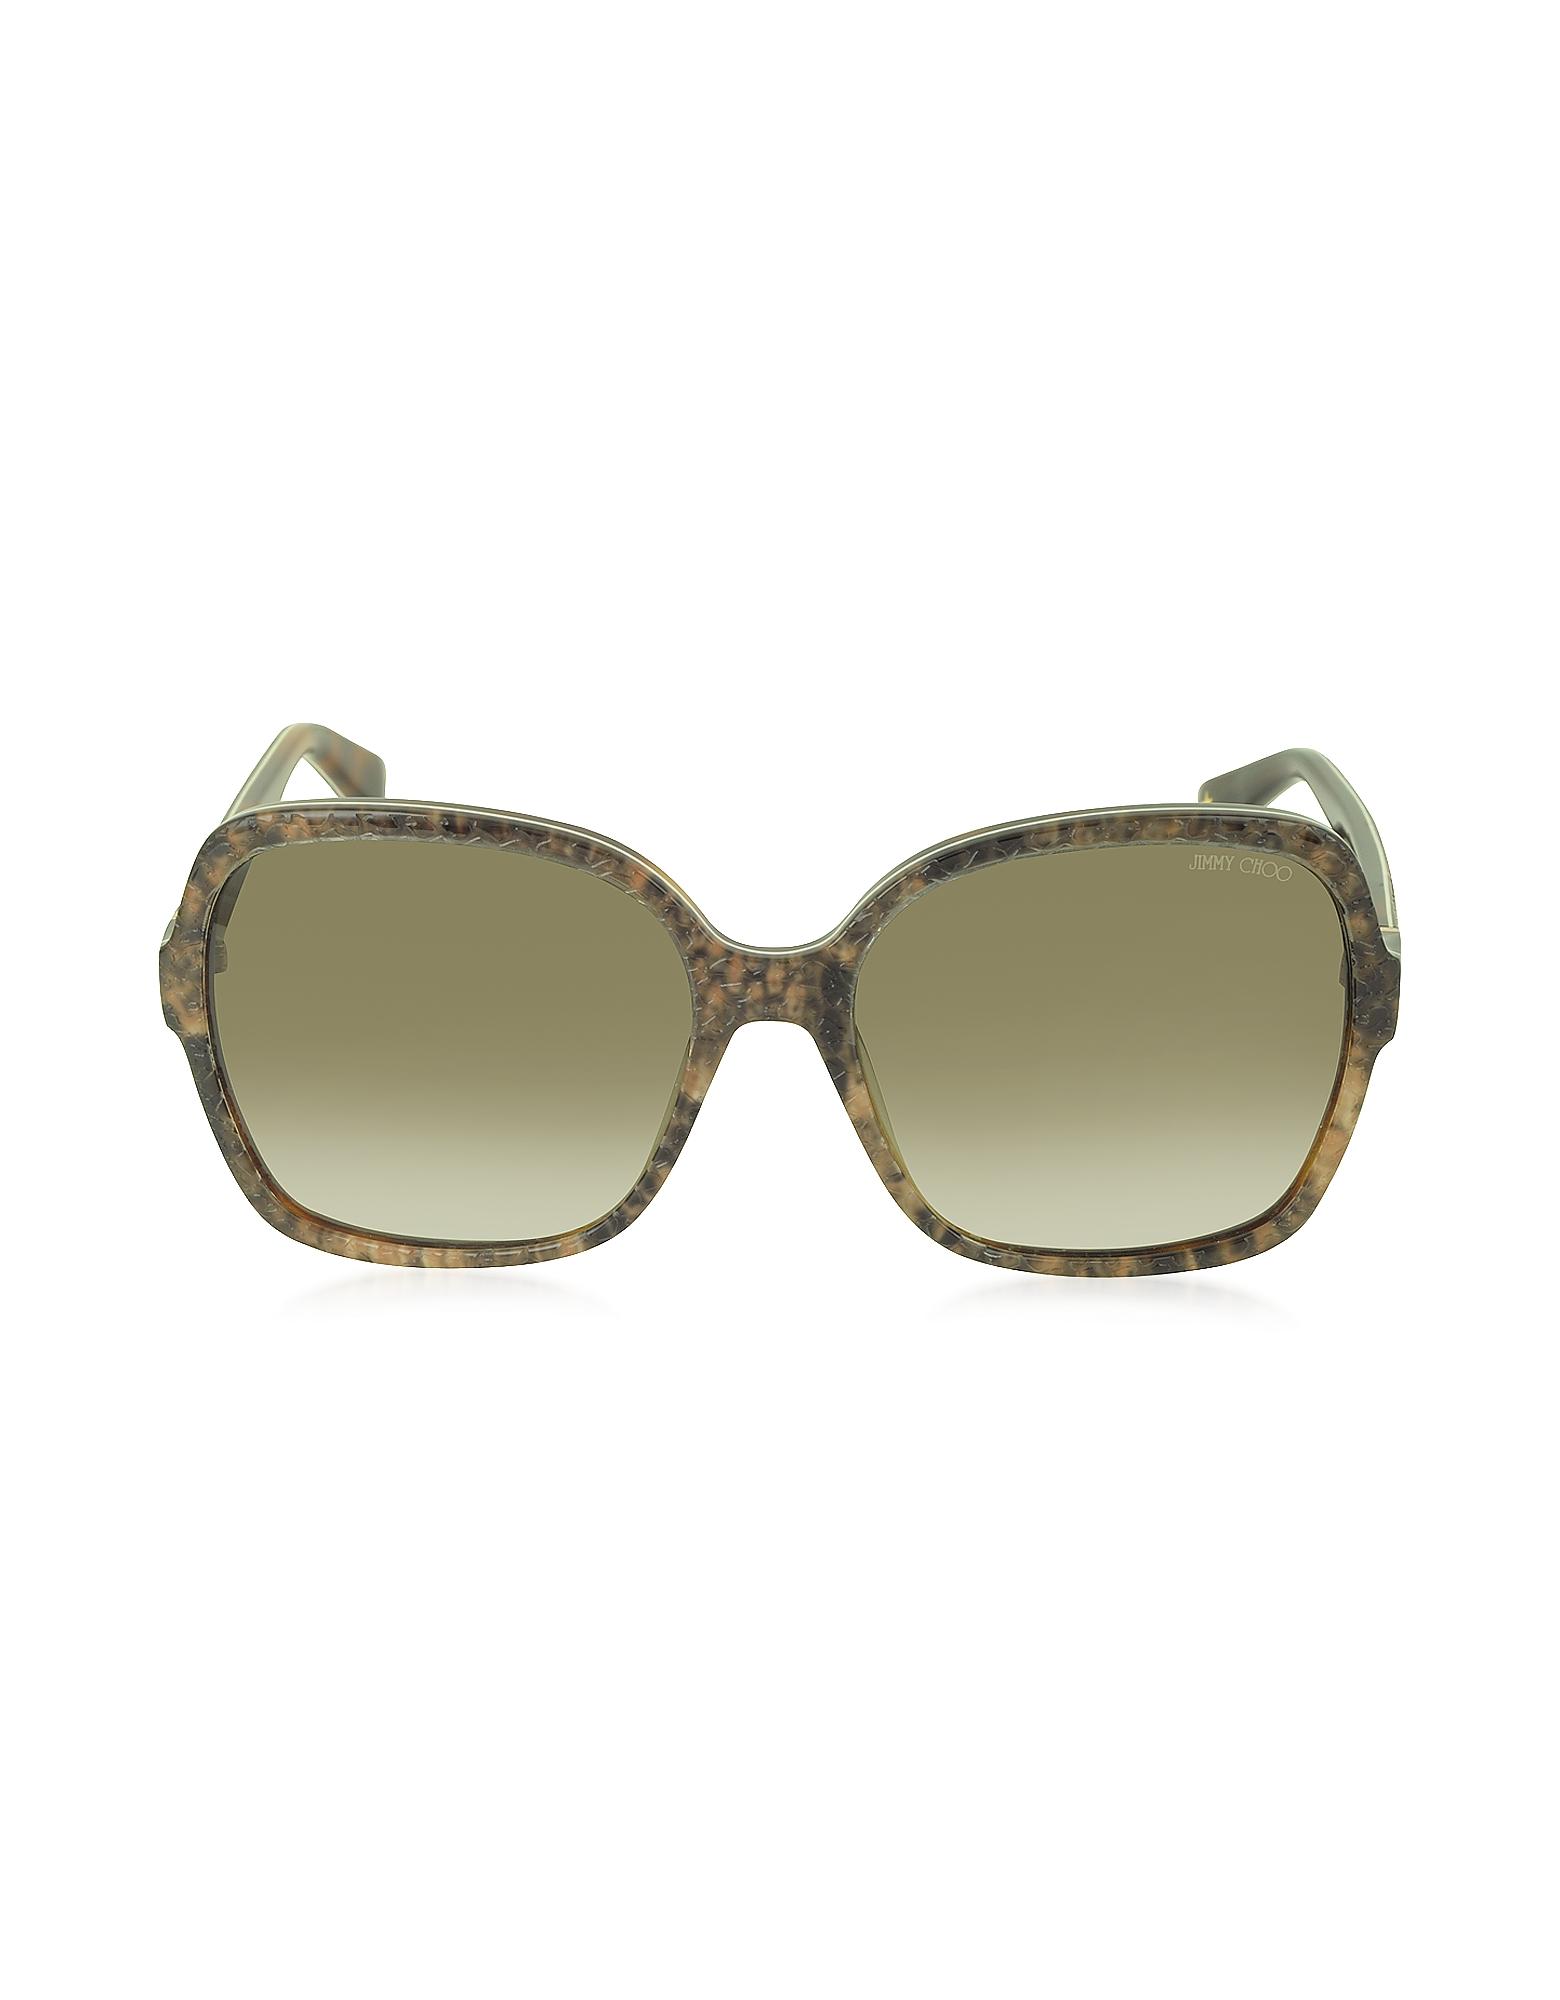 Jimmy Choo Sunglasses, LORI/S 6UJDB Oversize Python Print Acetate Women's Sunglasses